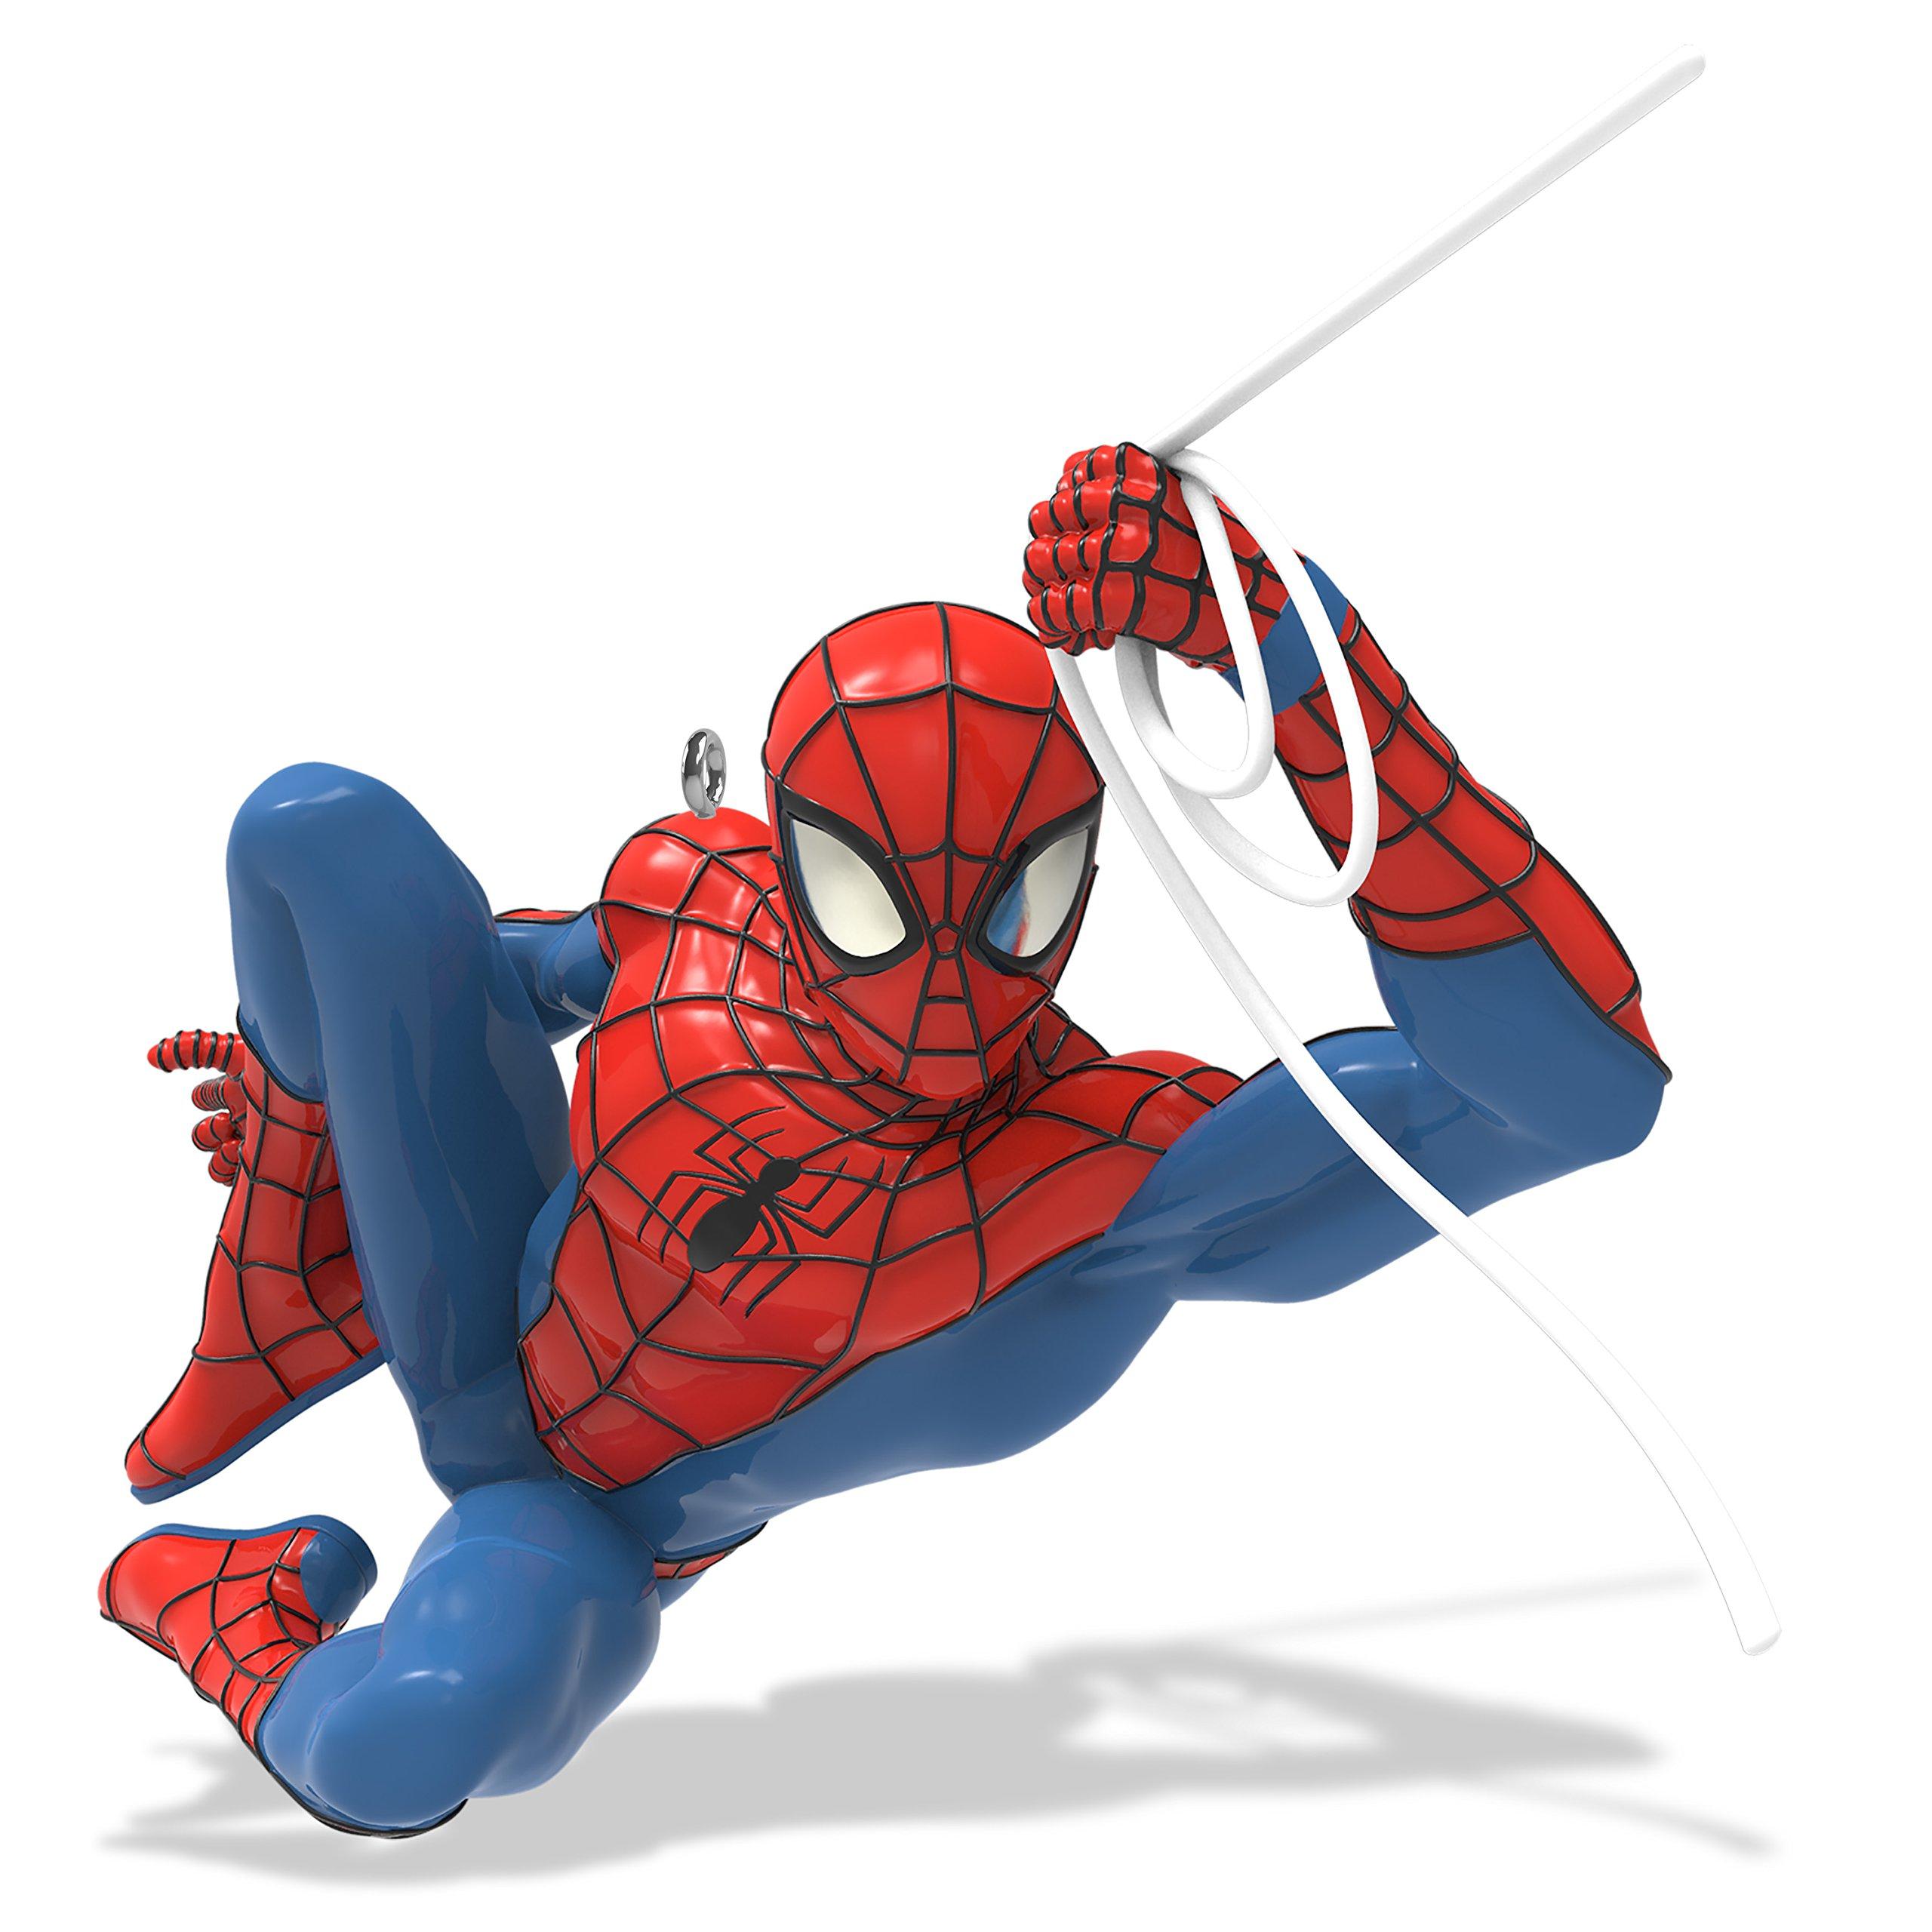 Hallmark Keepsake Christmas Ornament 2018 Year Dated, Marvel Spiderman Spidey Swings into Action